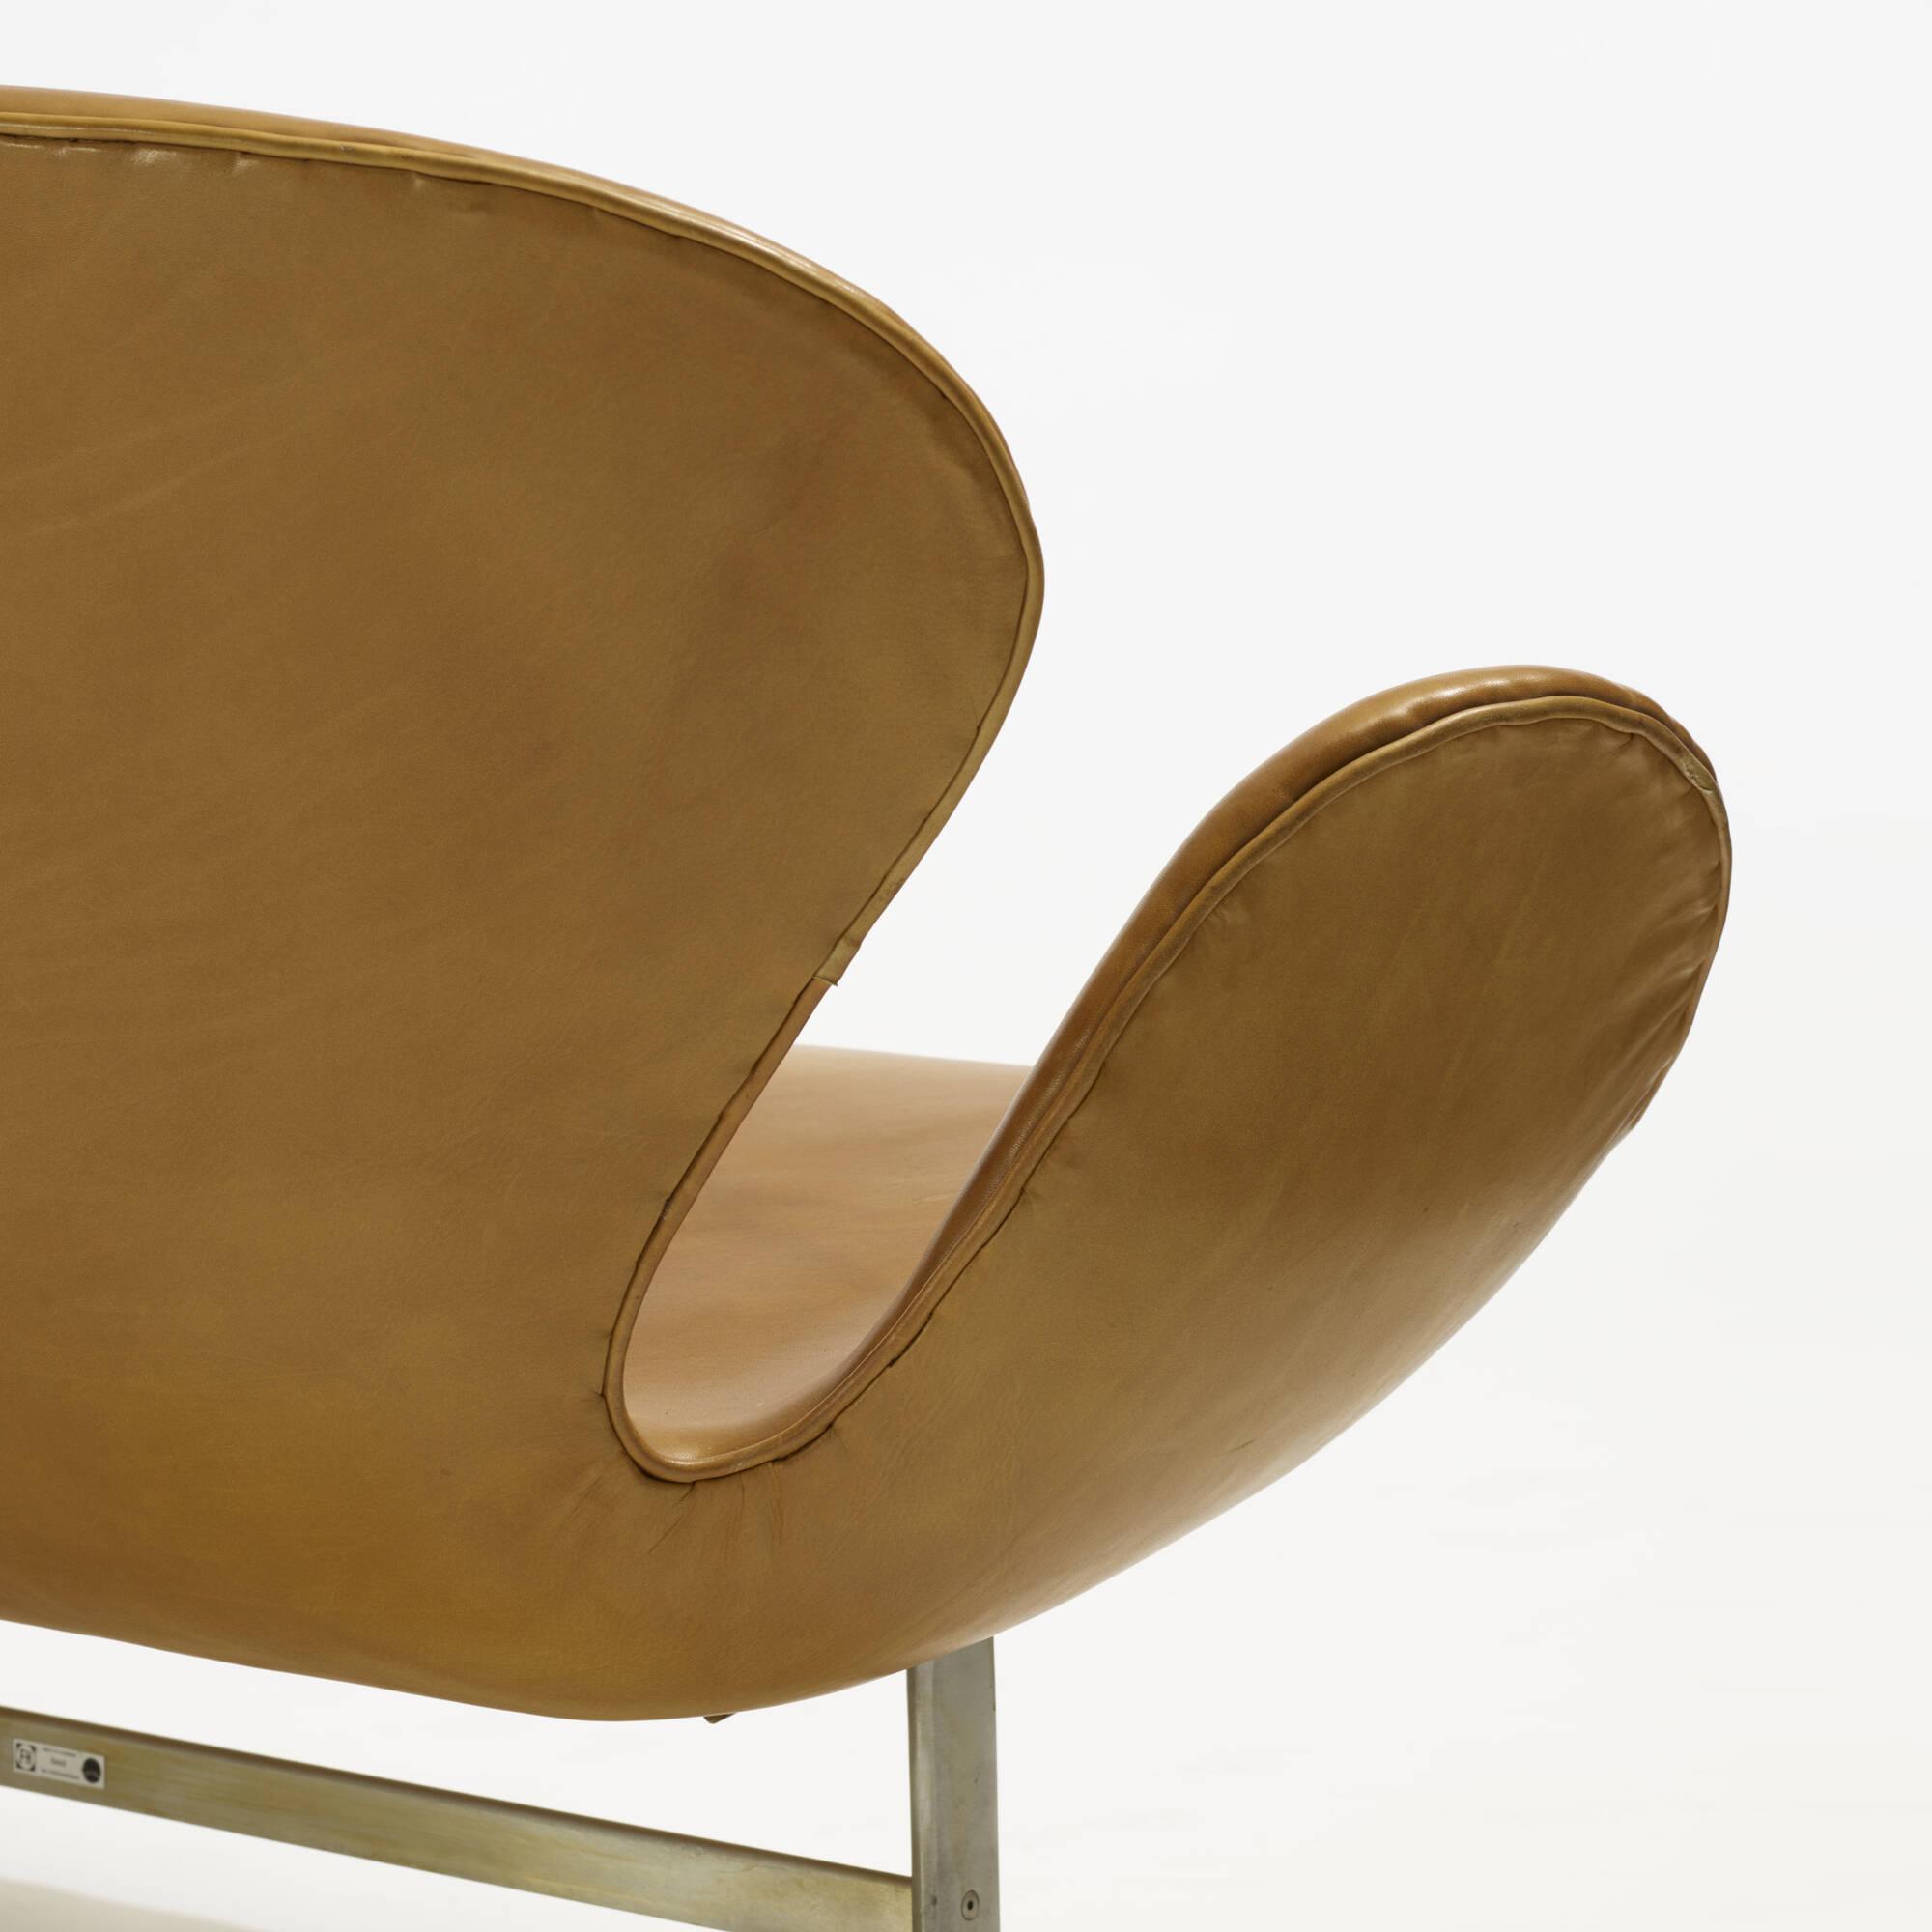 106: Arne Jacobsen / Swan settee, model 3321 (4 of 5)